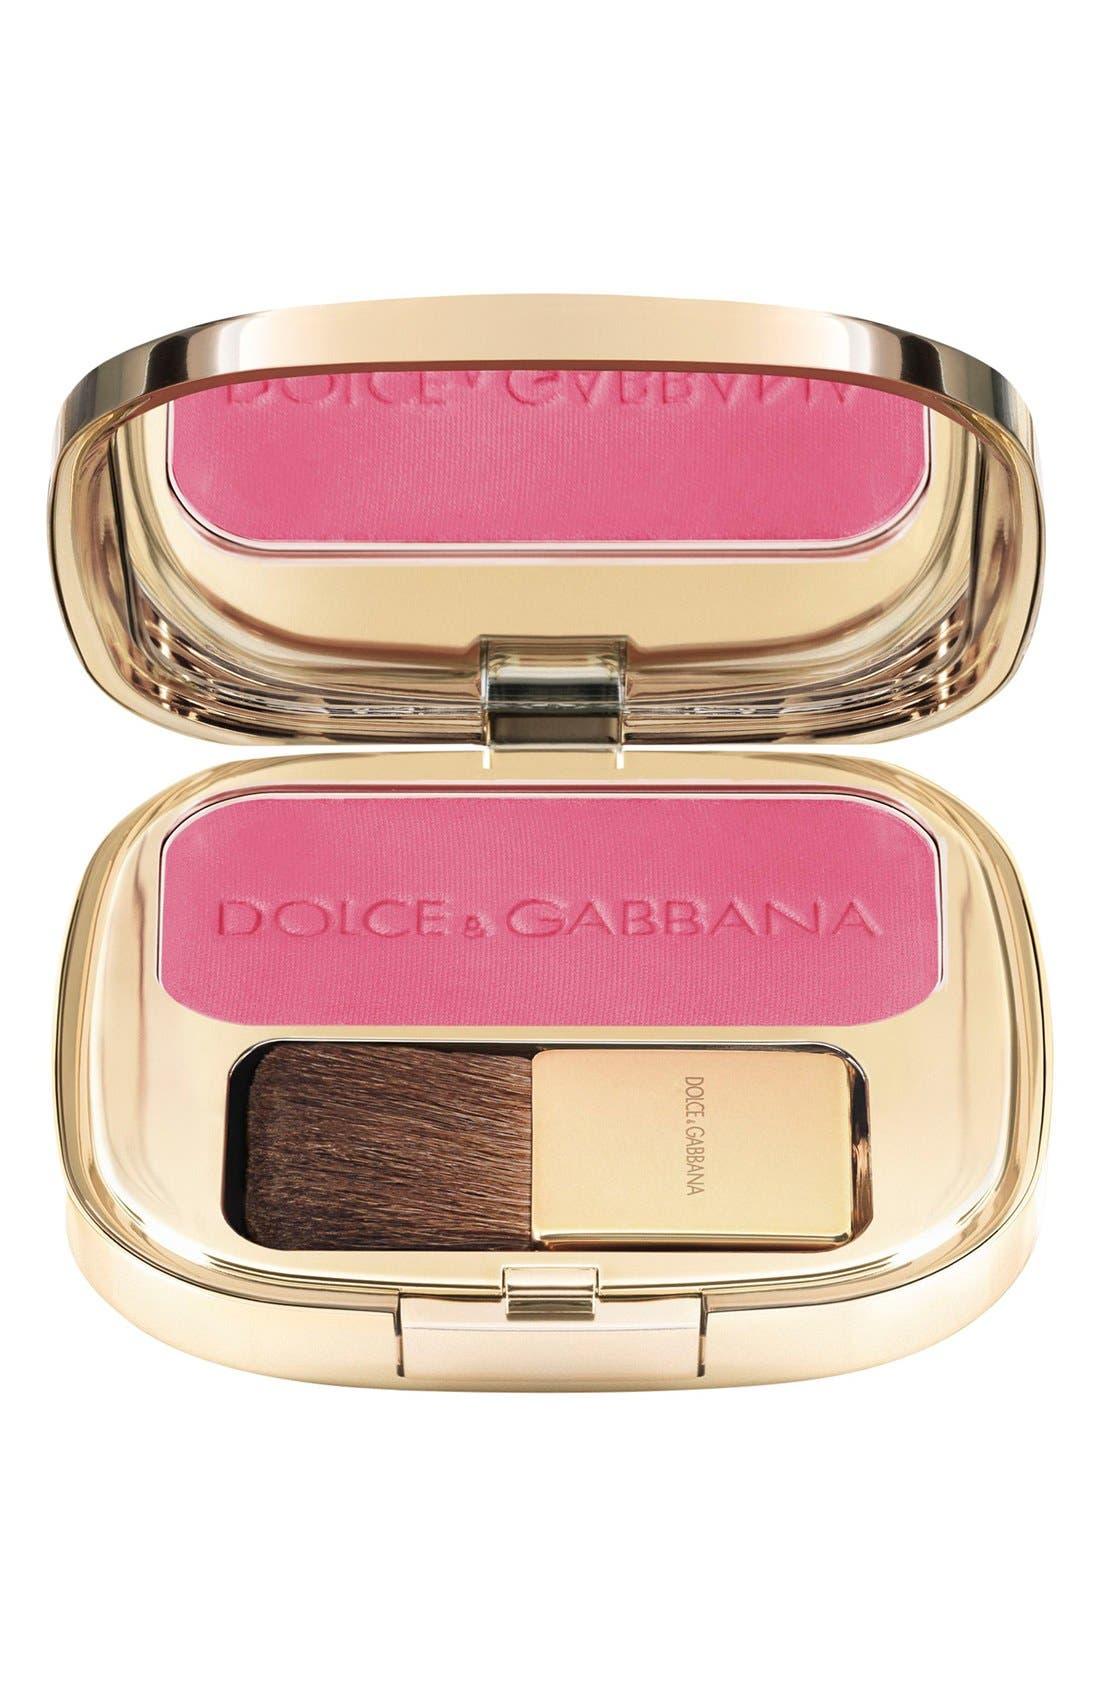 DOLCE&GABBANA BEAUTY, Luminous Cheek Color Blush, Main thumbnail 1, color, 659